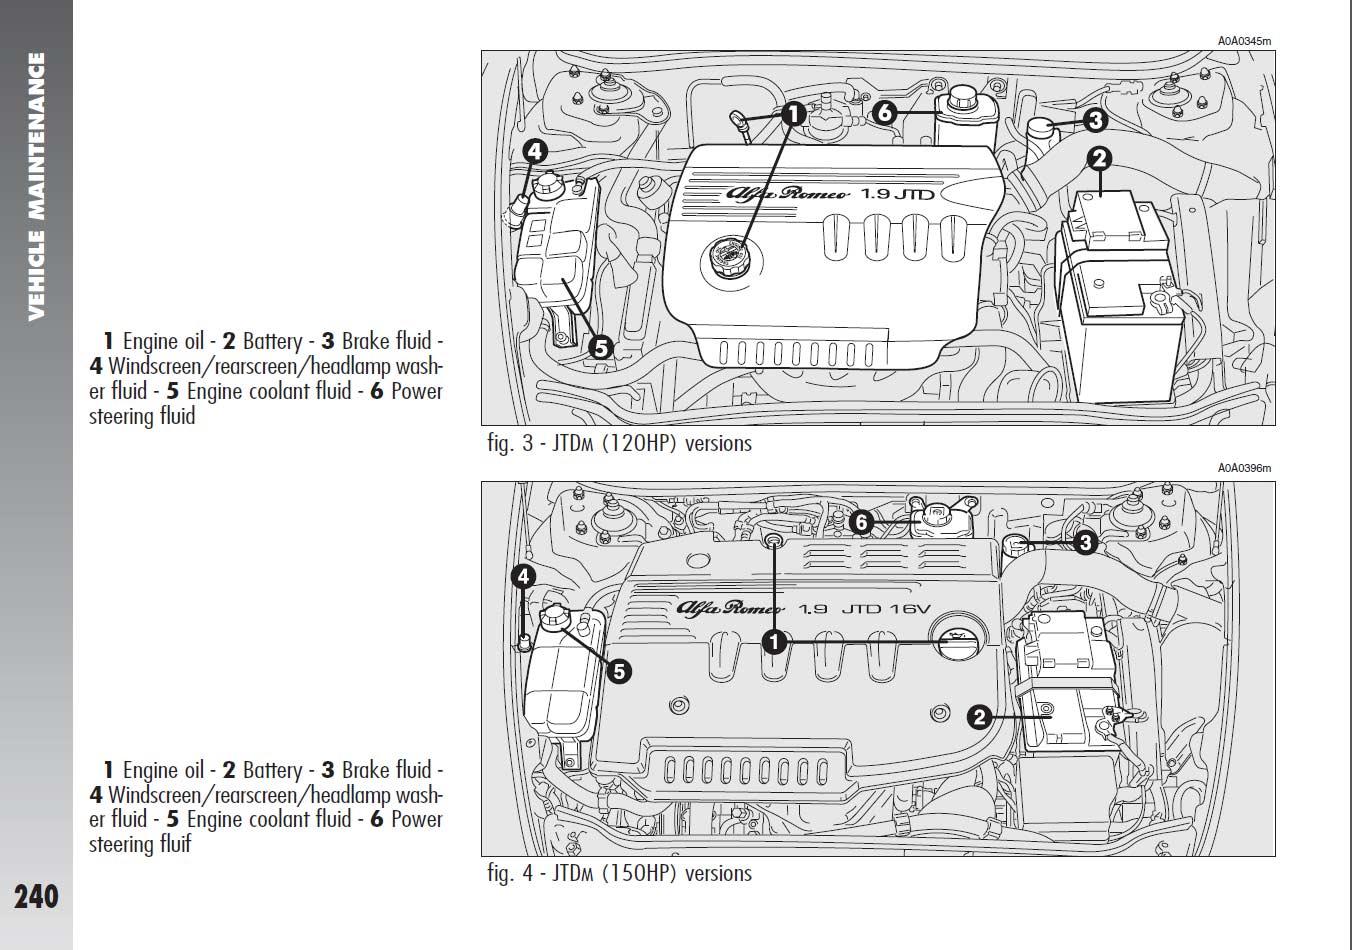 hight resolution of alfa romeo engine diagram wiring diagram loc alfa romeo 159 engine diagram alfa romeo 147 engine